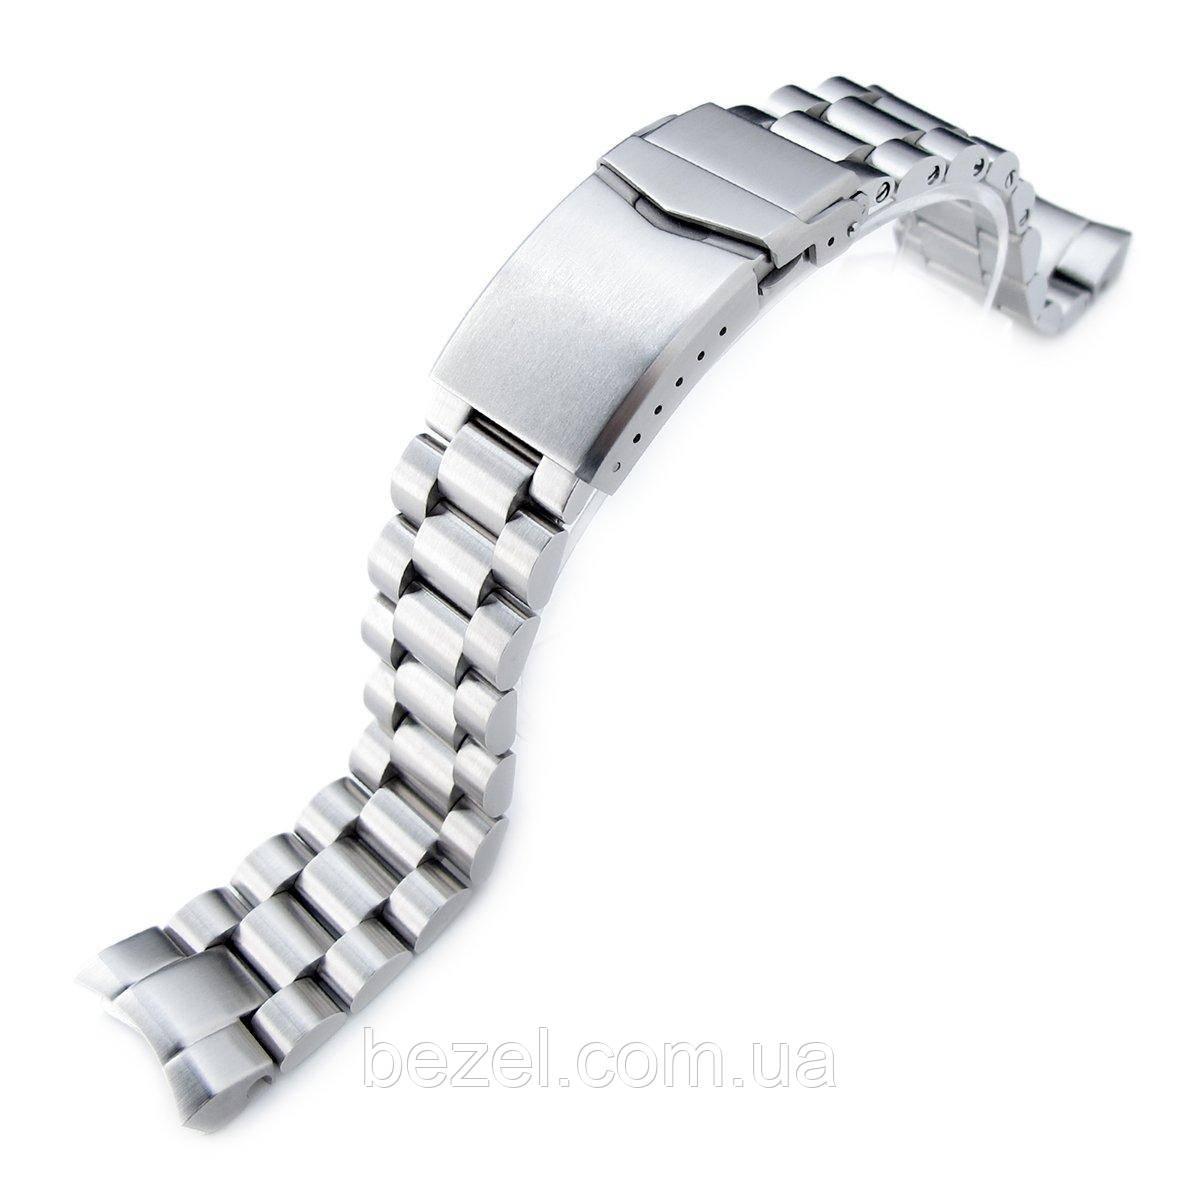 20mm Endmill watch band for SEIKO Sumo SBDC001, SBDC003, SBDC005, SBDC031, SBDC033, V-Clasp